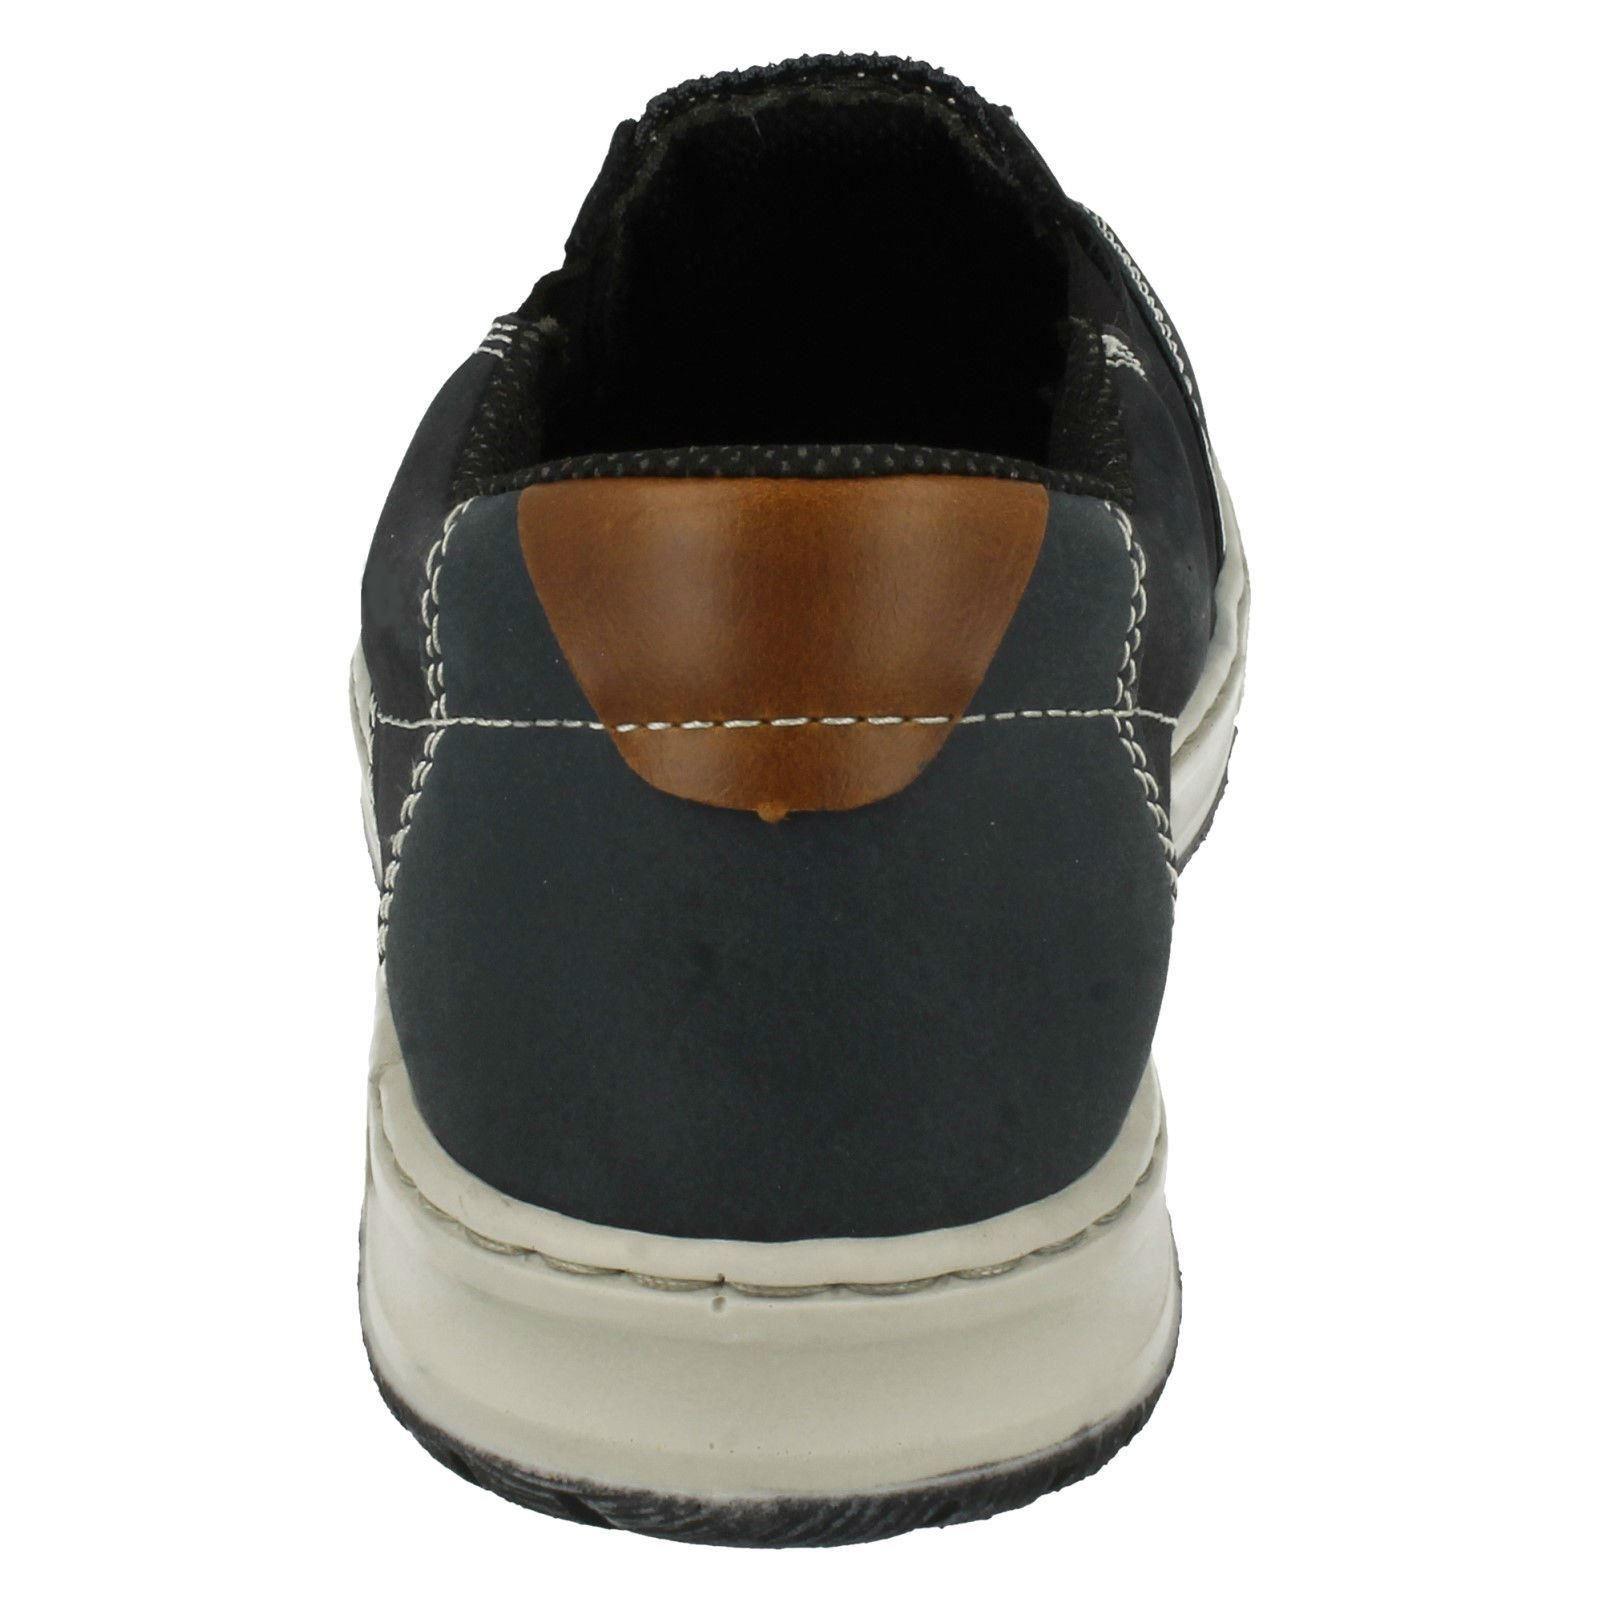 Scarpe casual da uomo  Da Uomo Rieker Scarpe Casual b3052